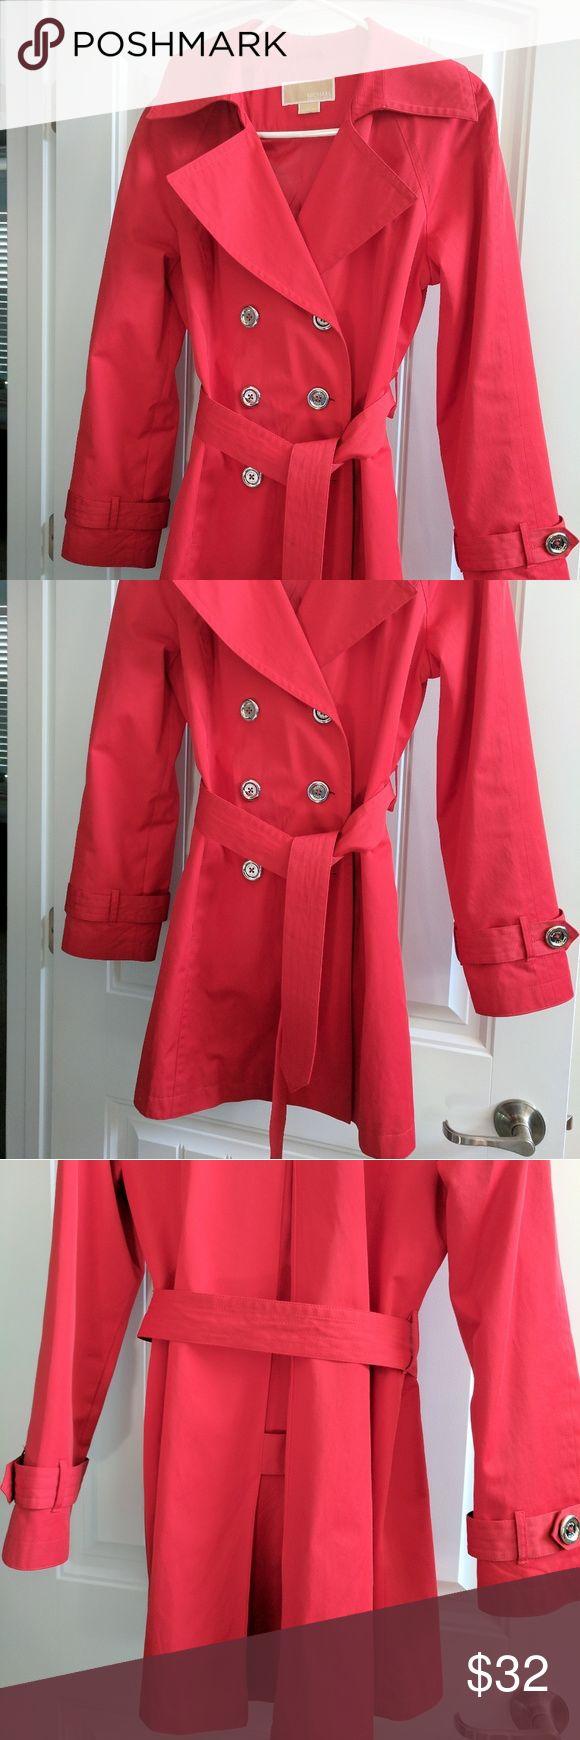 Top 25+ best Rain coats & trench coats ideas on Pinterest ...